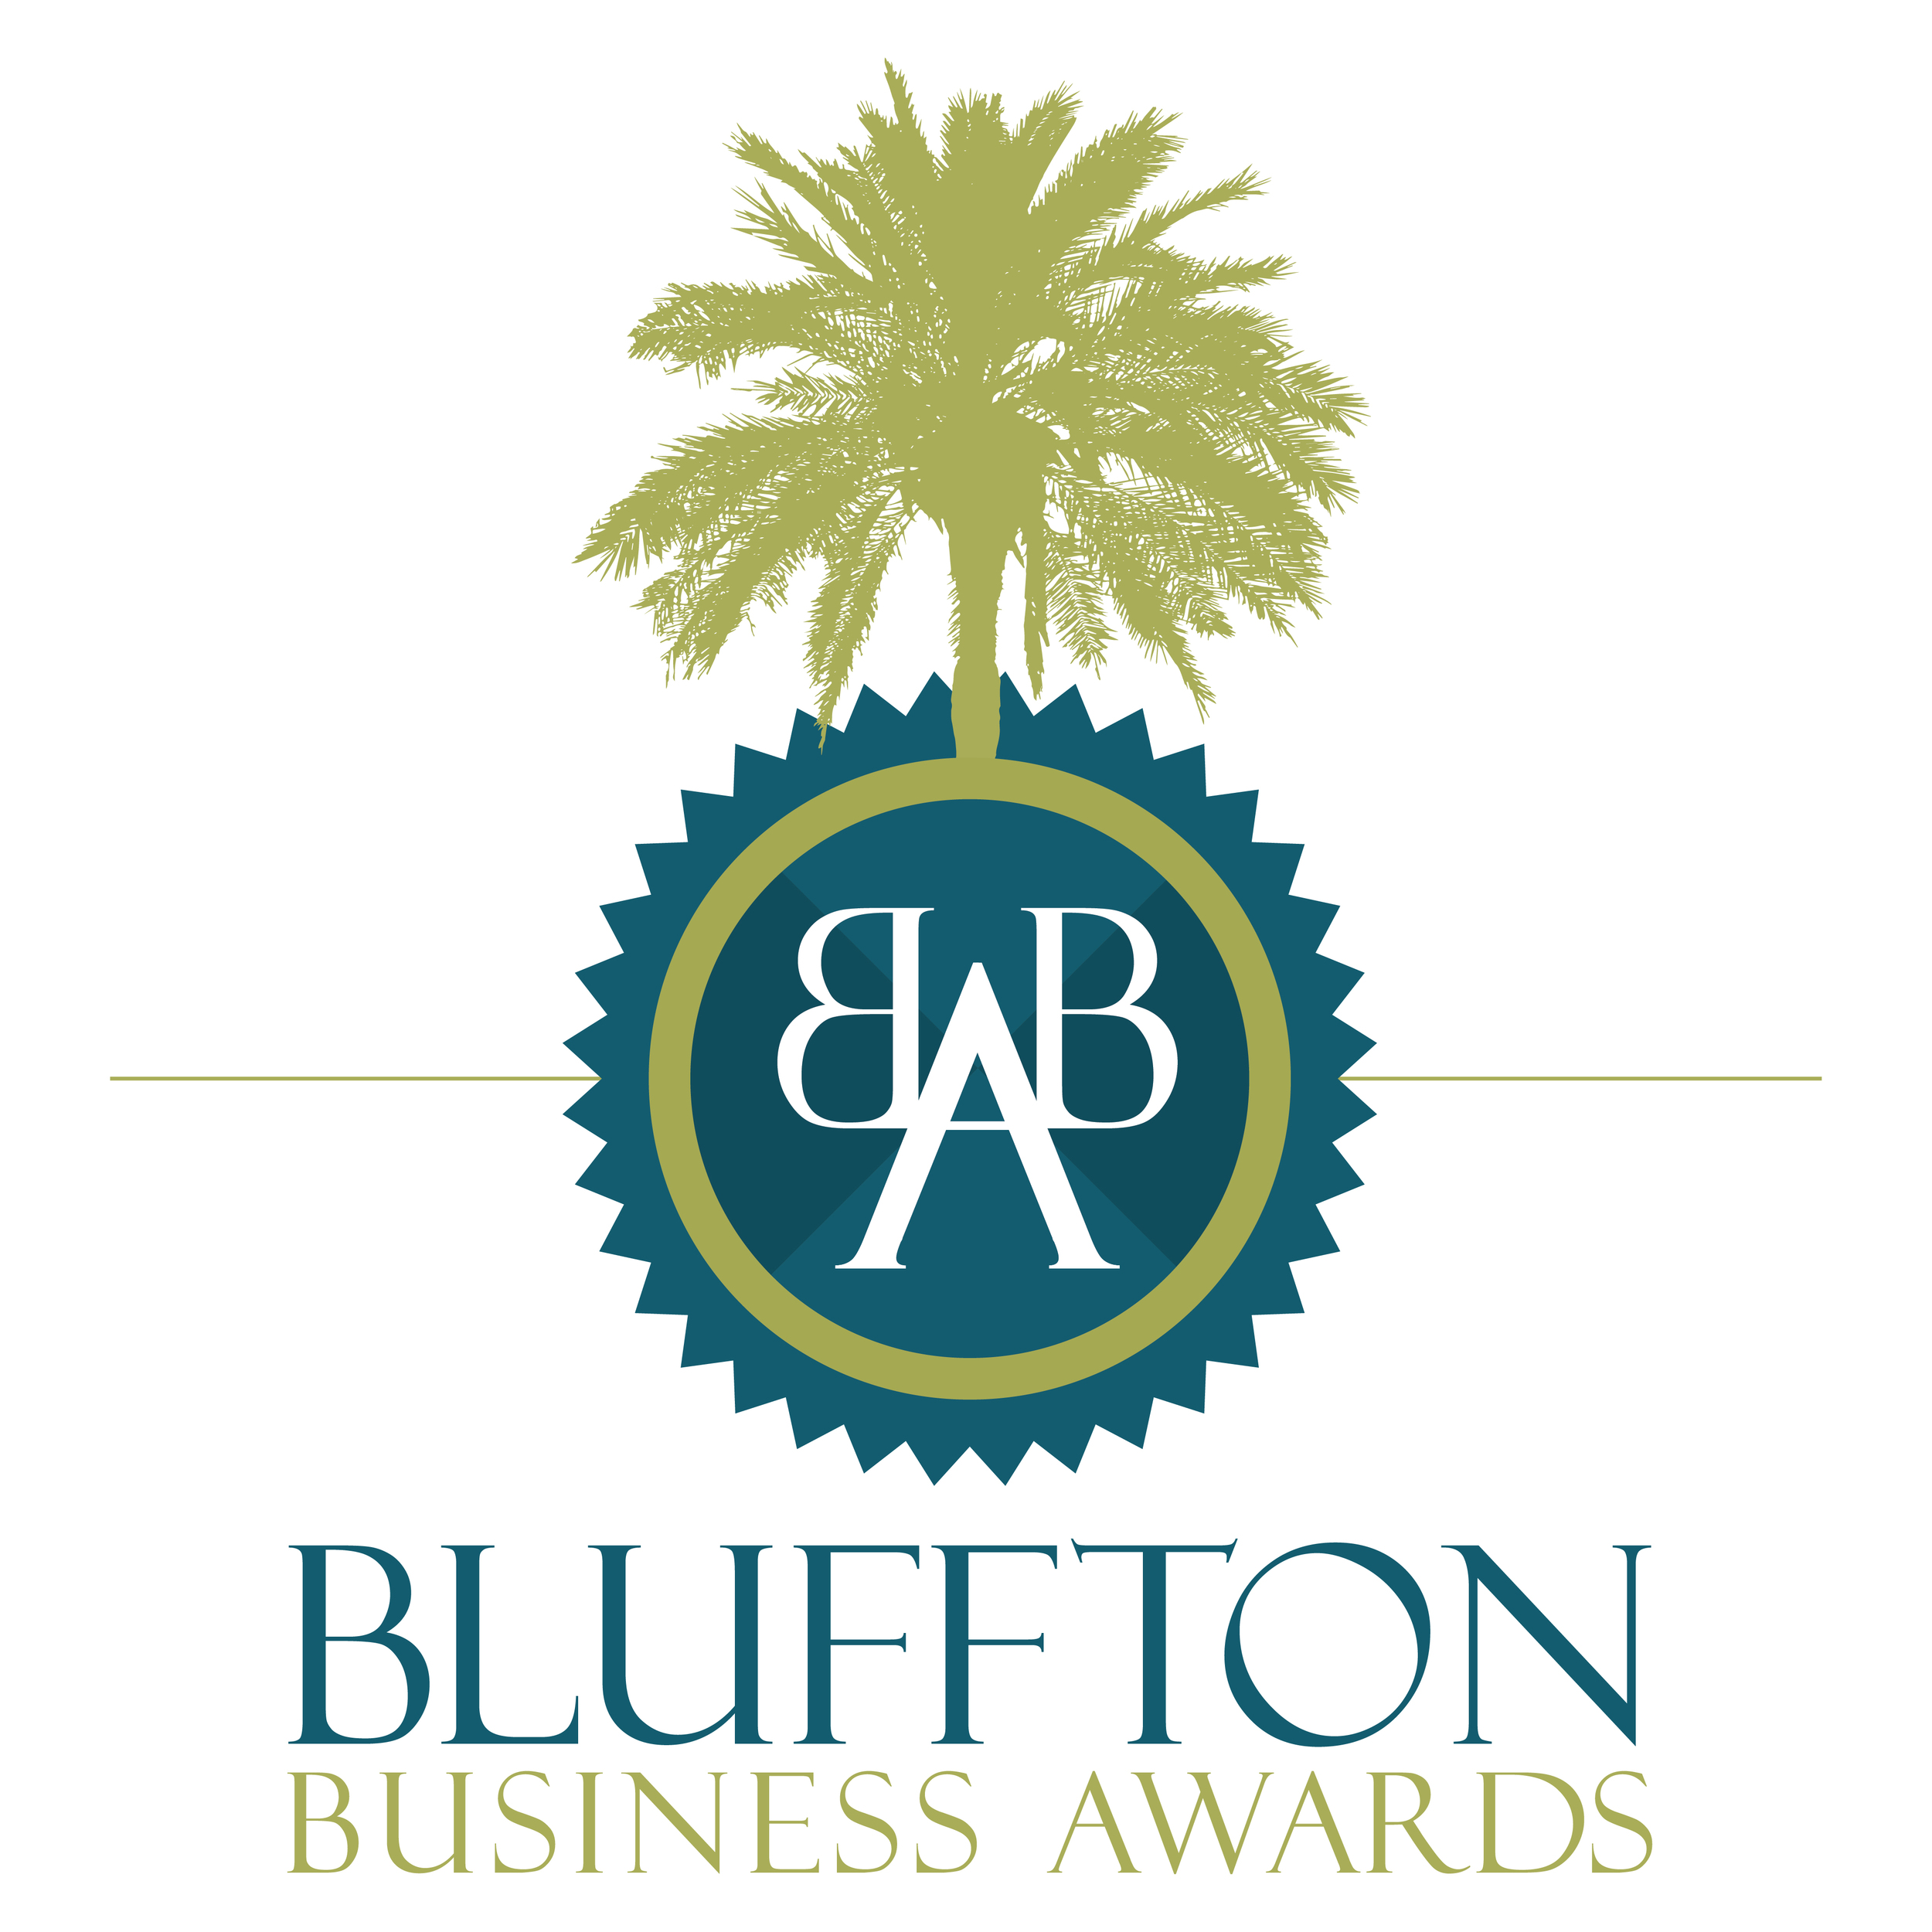 Bluffton Business Awards Logo | Bluffton Chamber of Commerce | Bluffton, SC